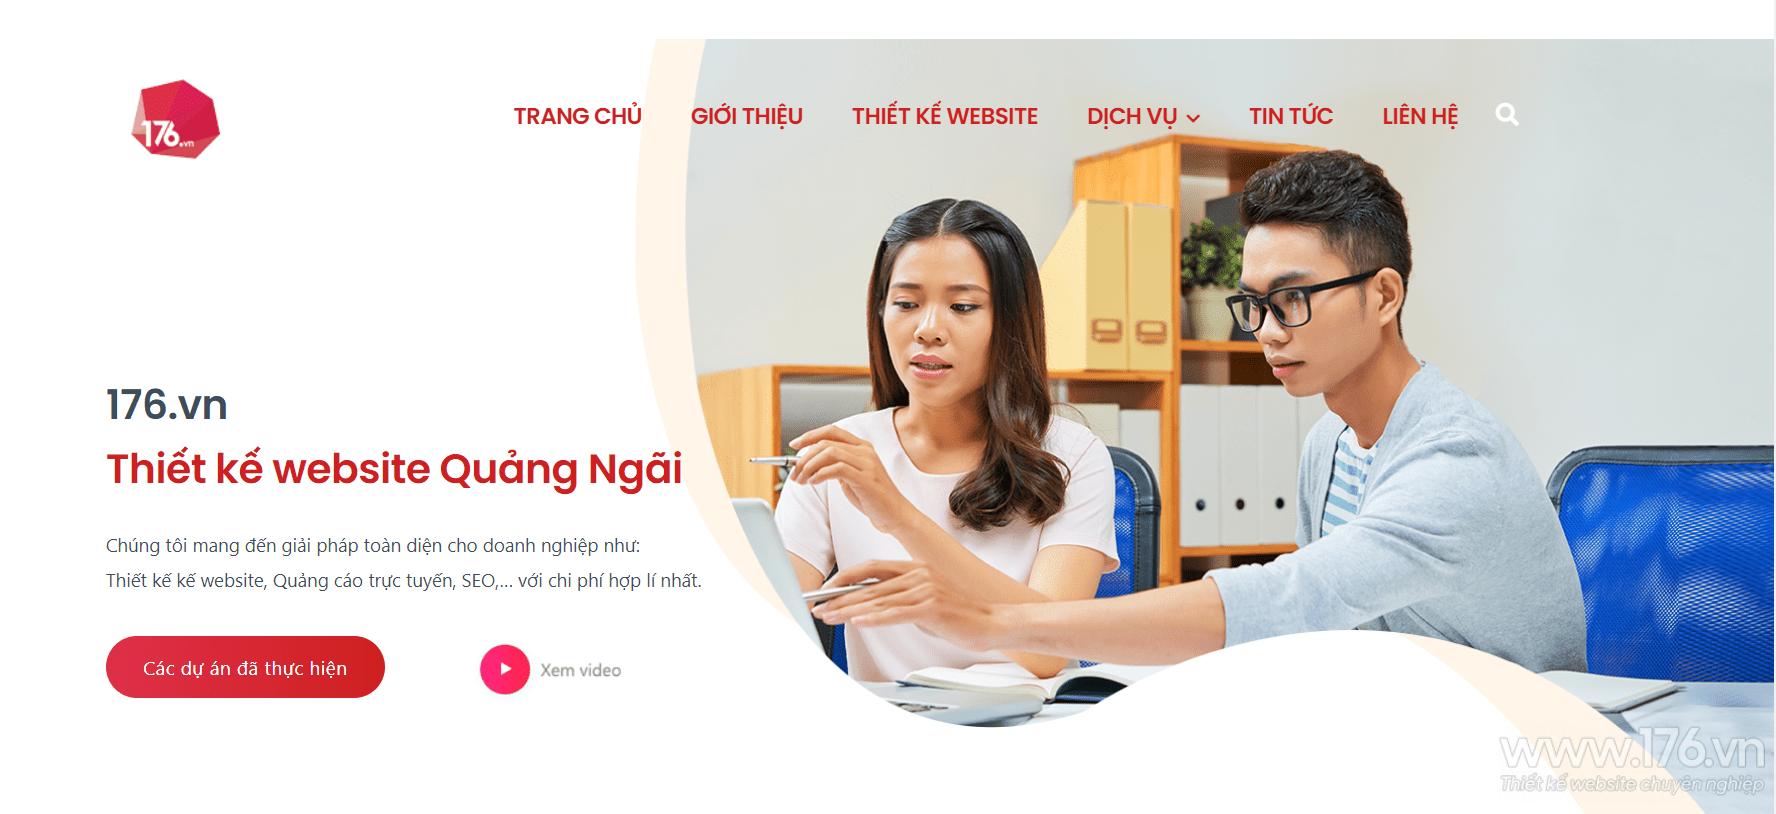 website van phong pham quang ngai